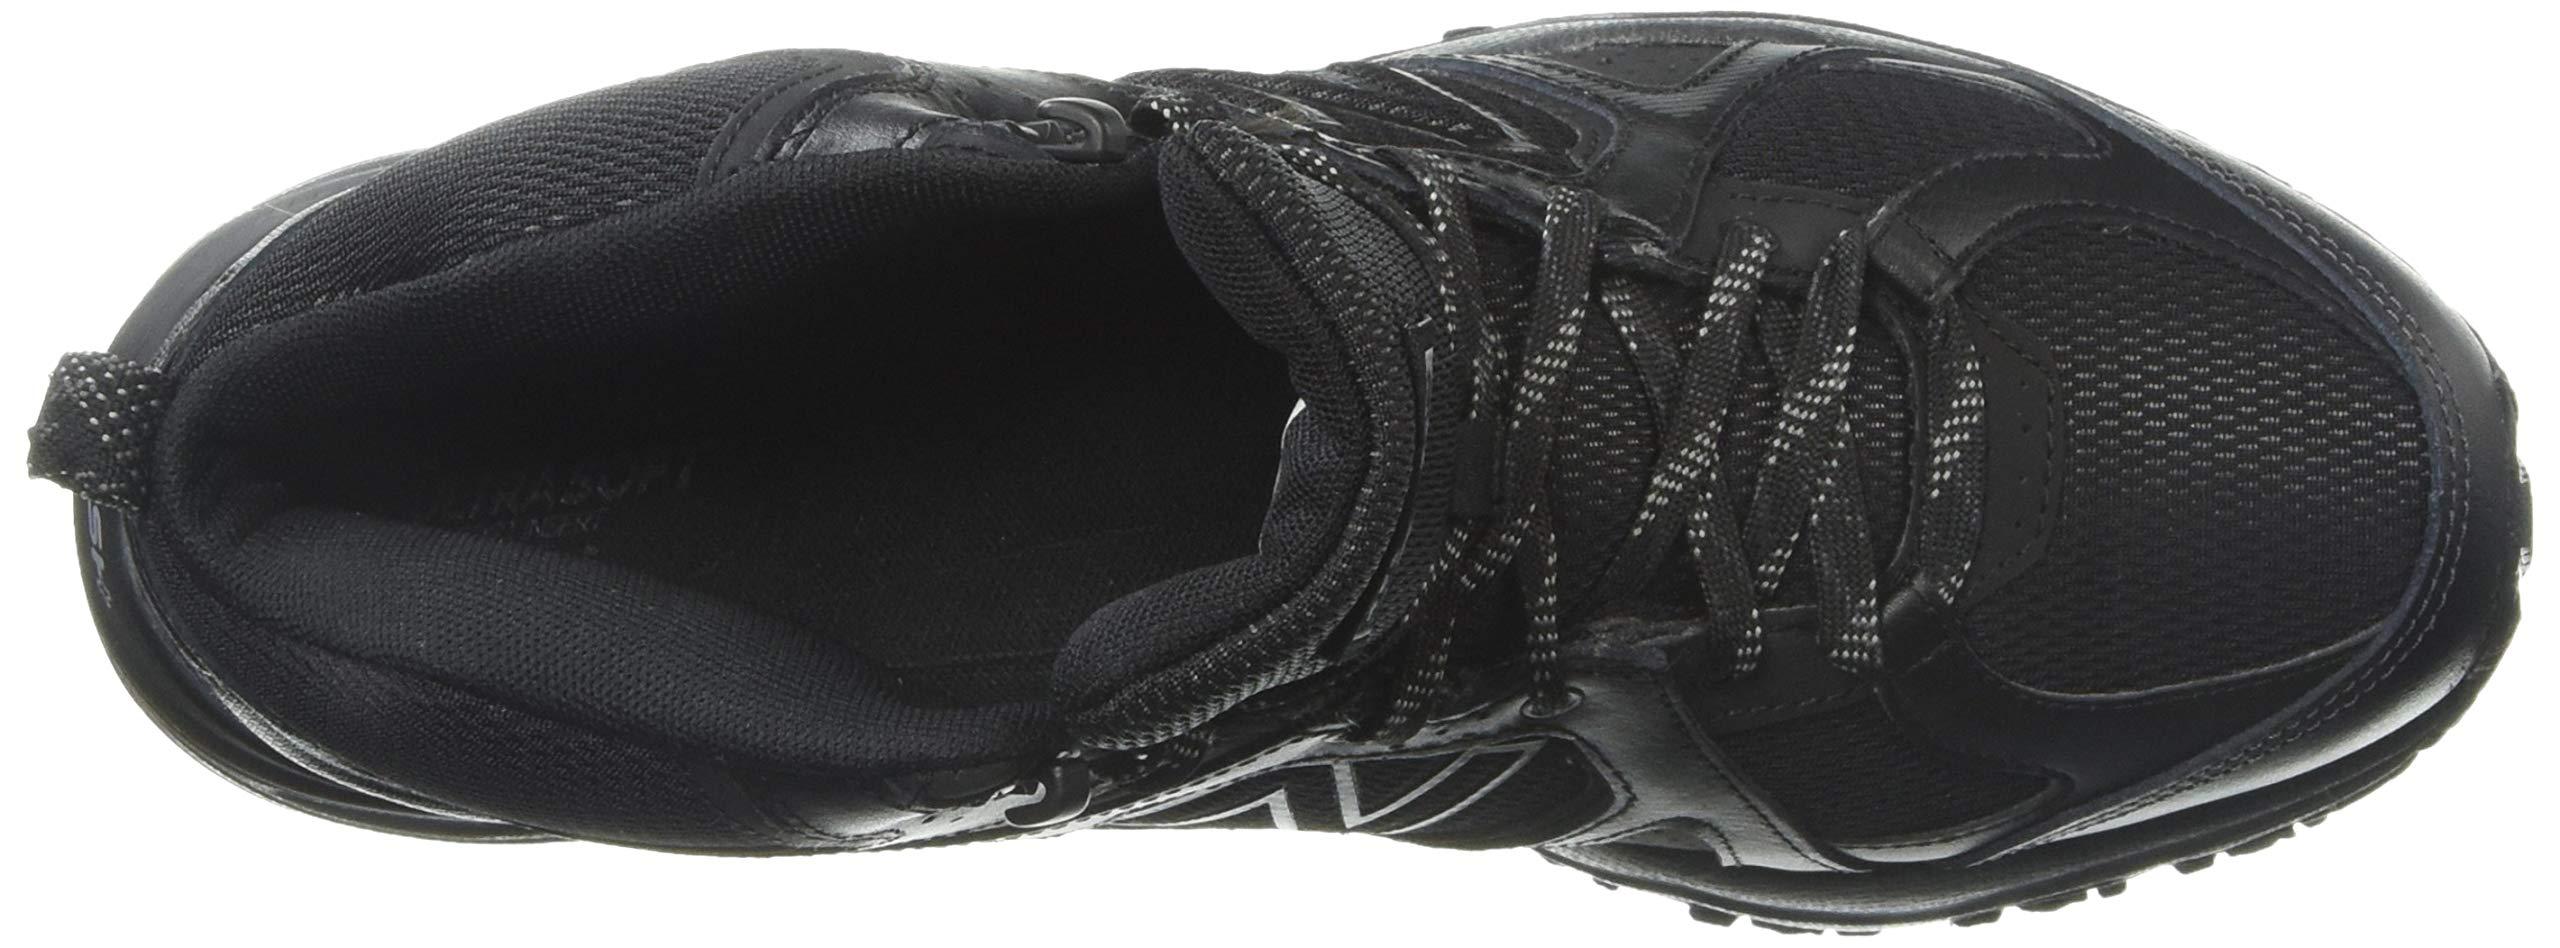 New Balance Men's 481 V3 Cushioning Trail Running Shoe Black/Magnet 9.5 D US by New Balance (Image #8)